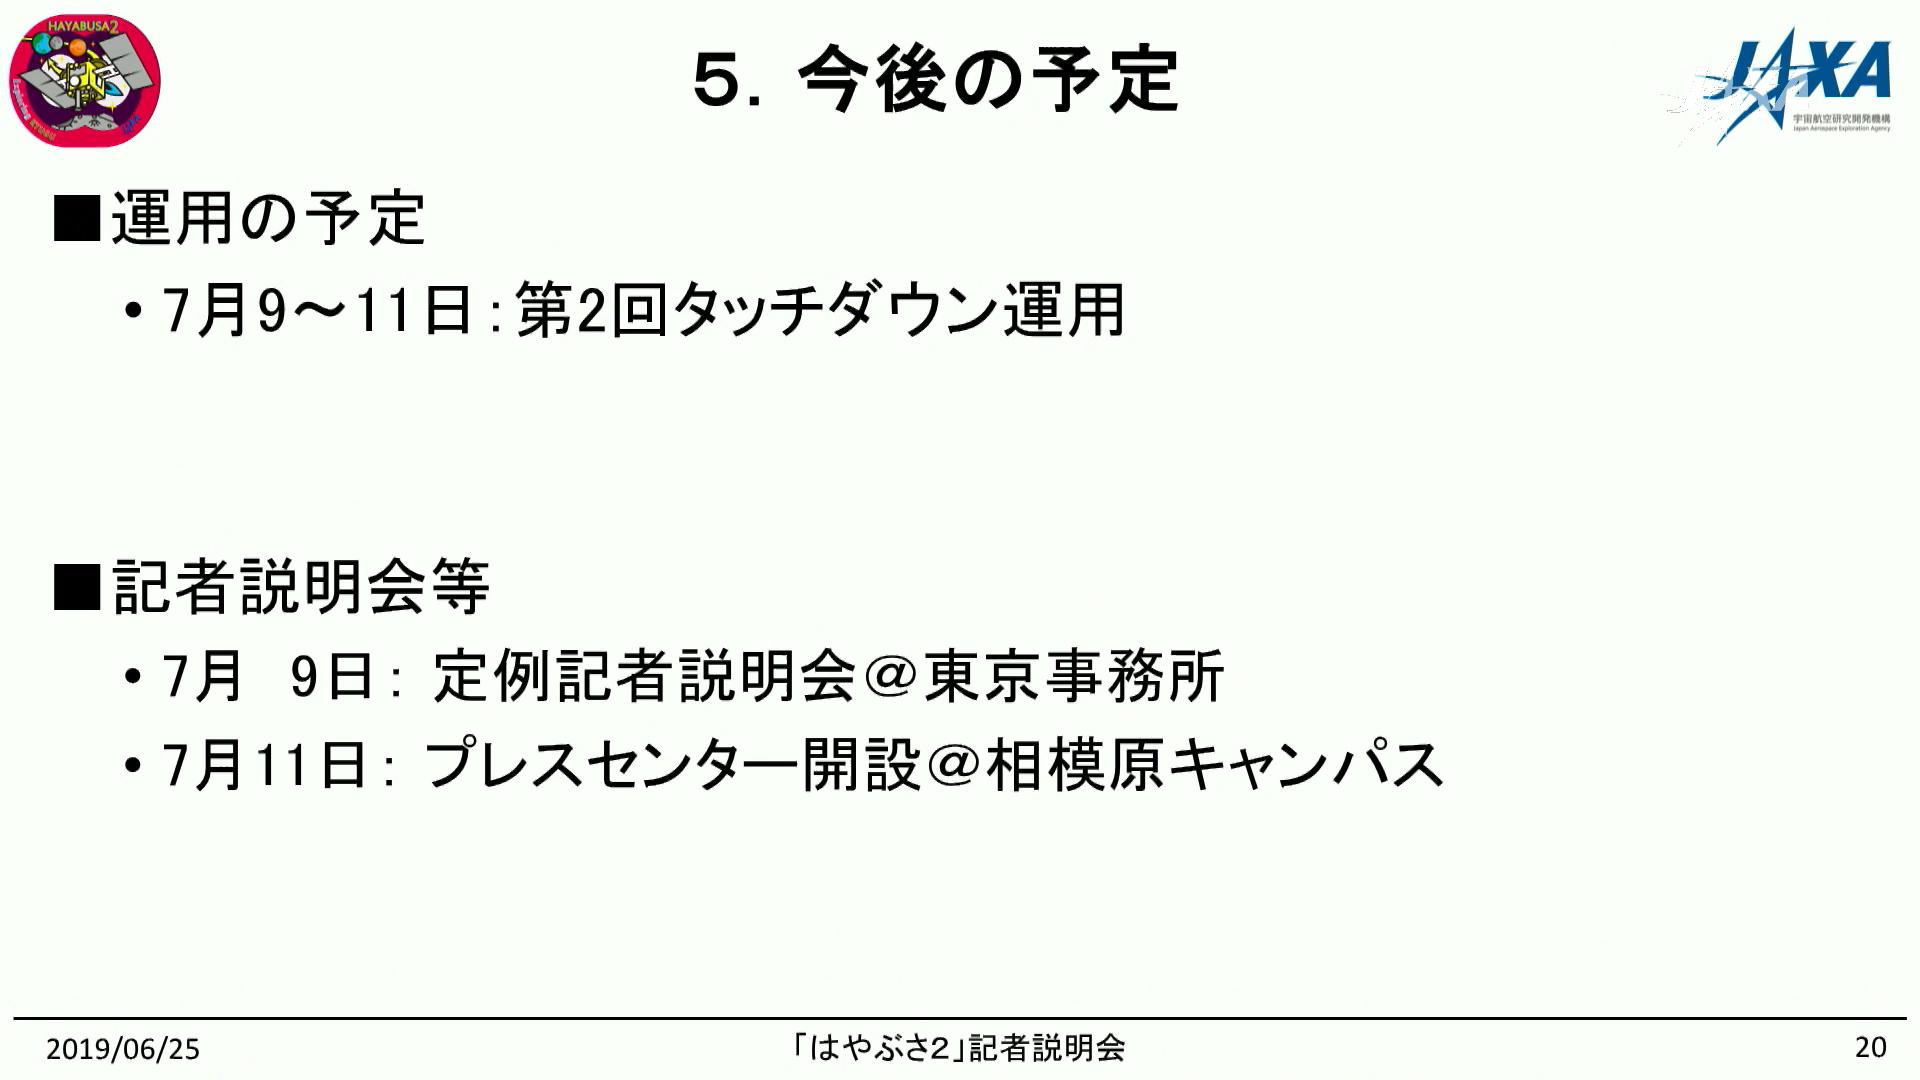 f:id:Imamura:20190625234842p:plain